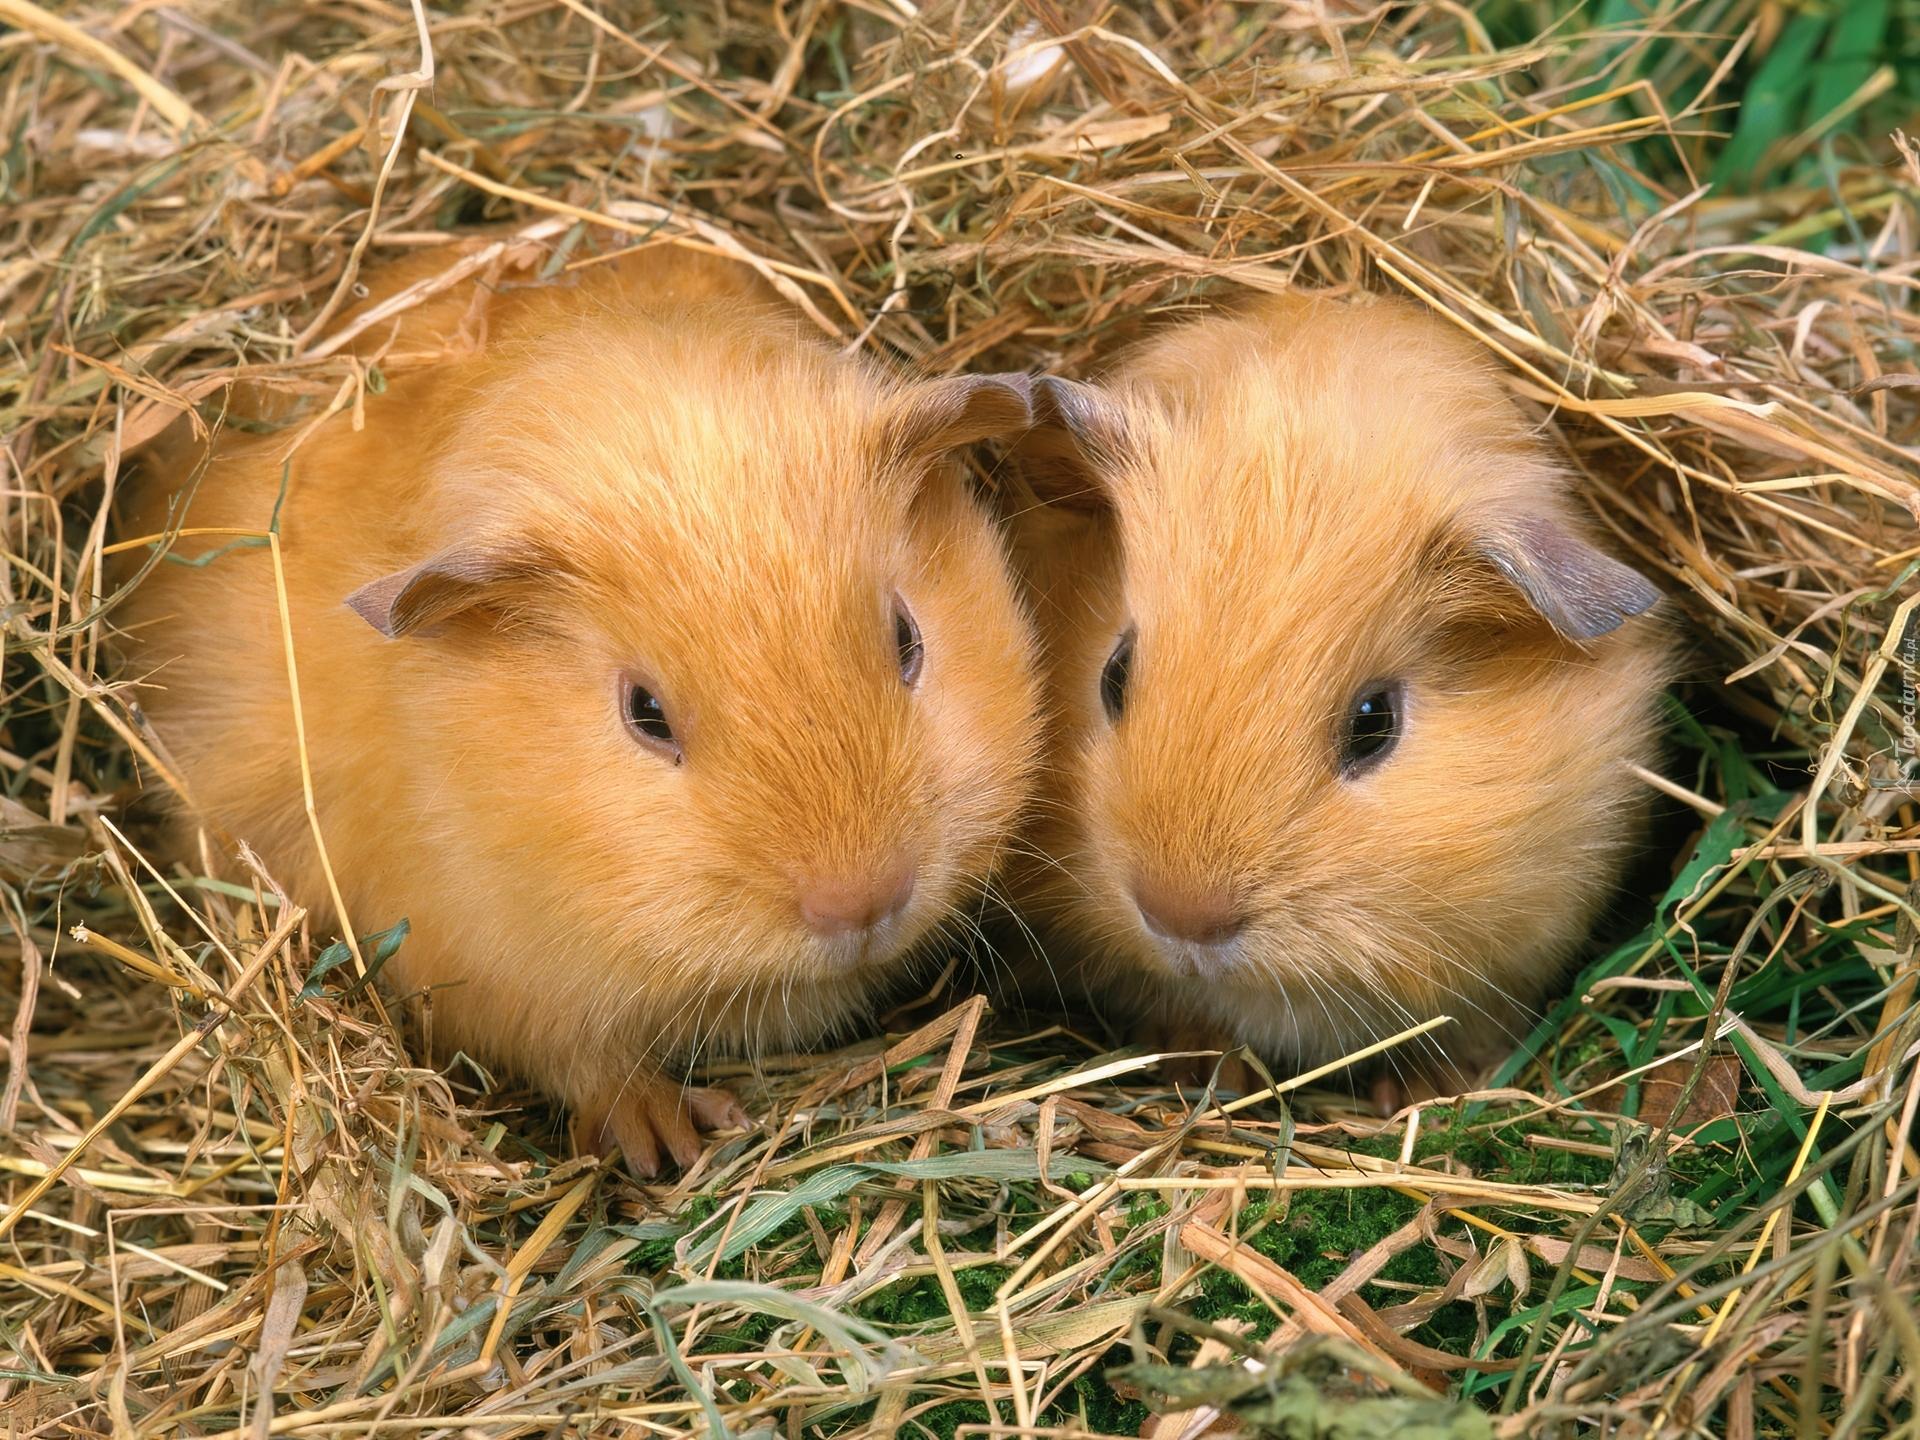 guinea pig wallpaper hd